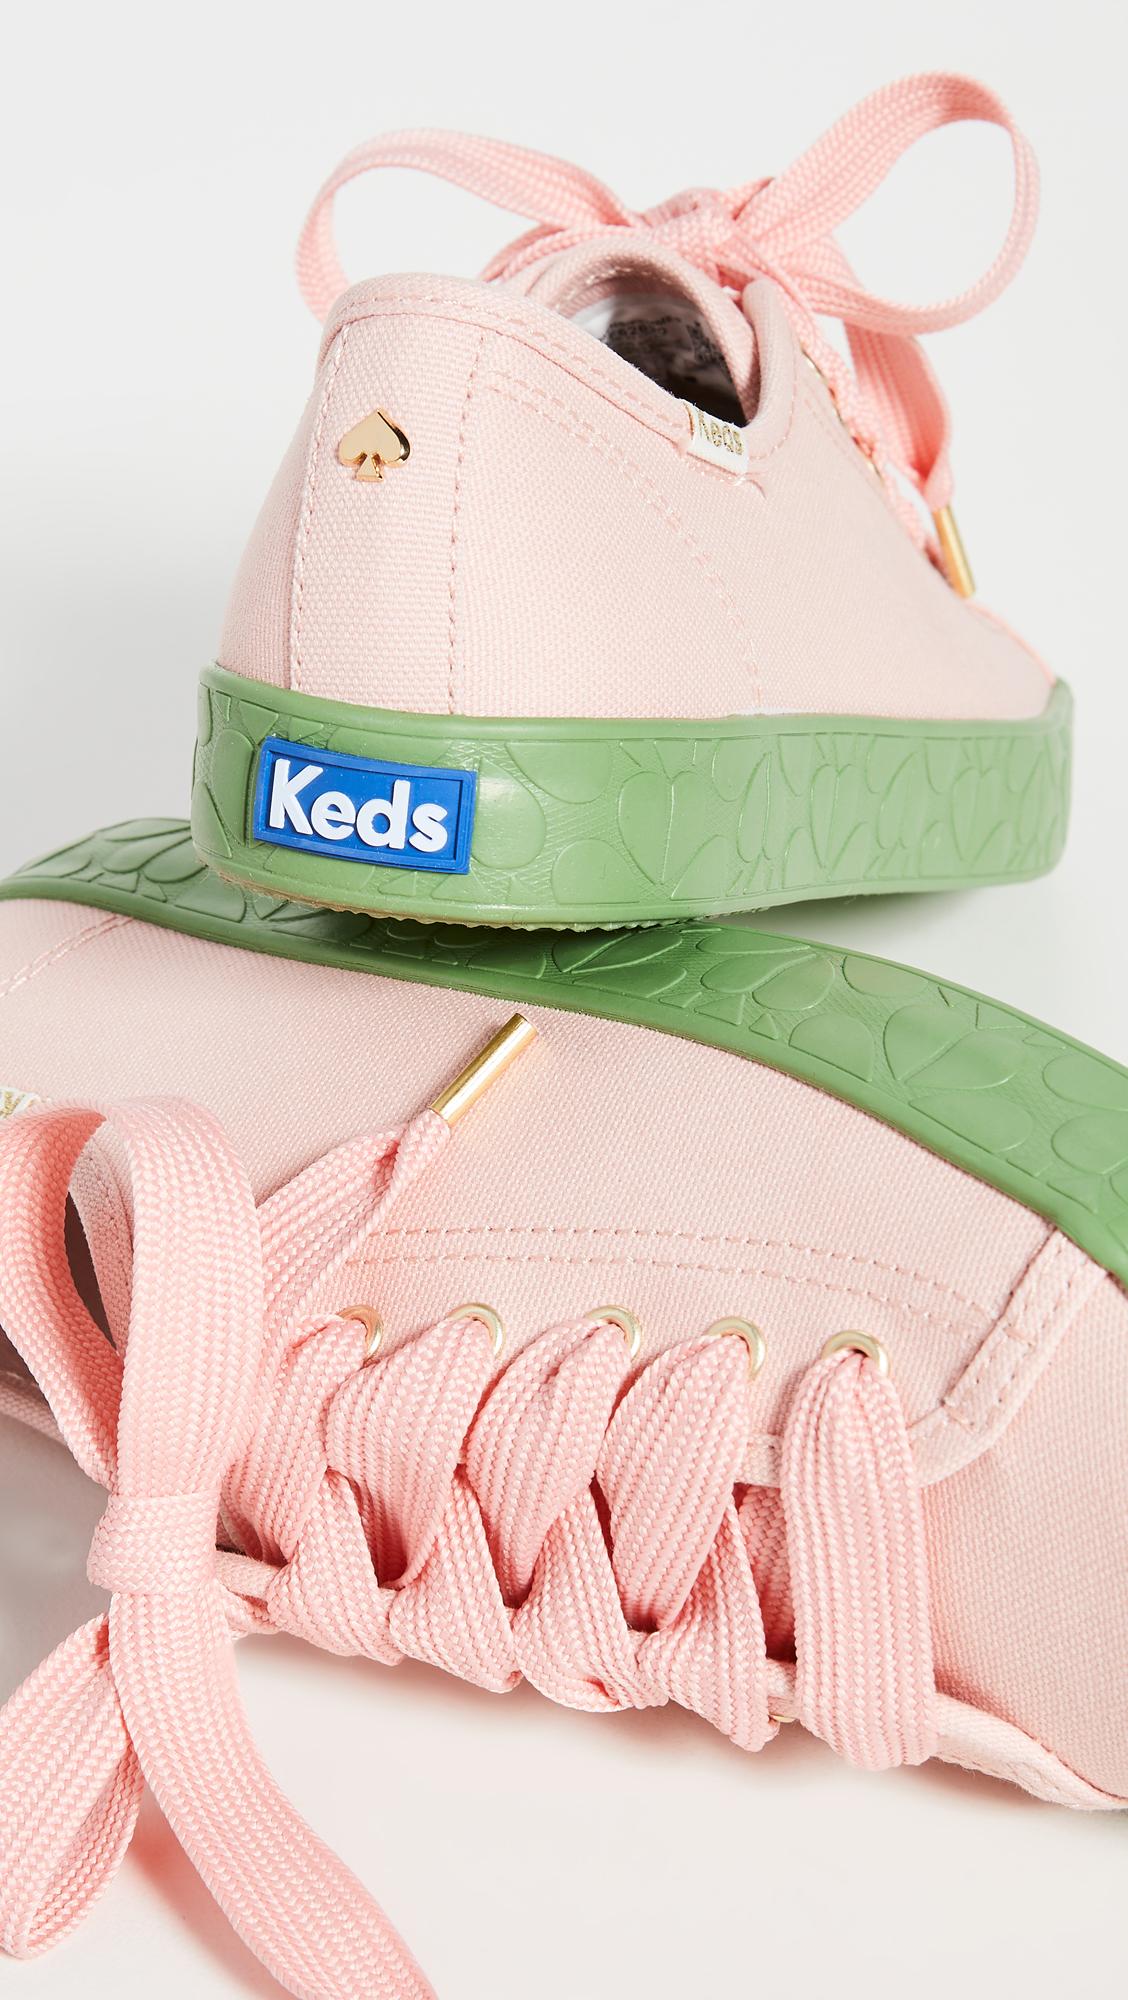 Keds x Kate Spade Kickstart Logo Foxing Sneakers